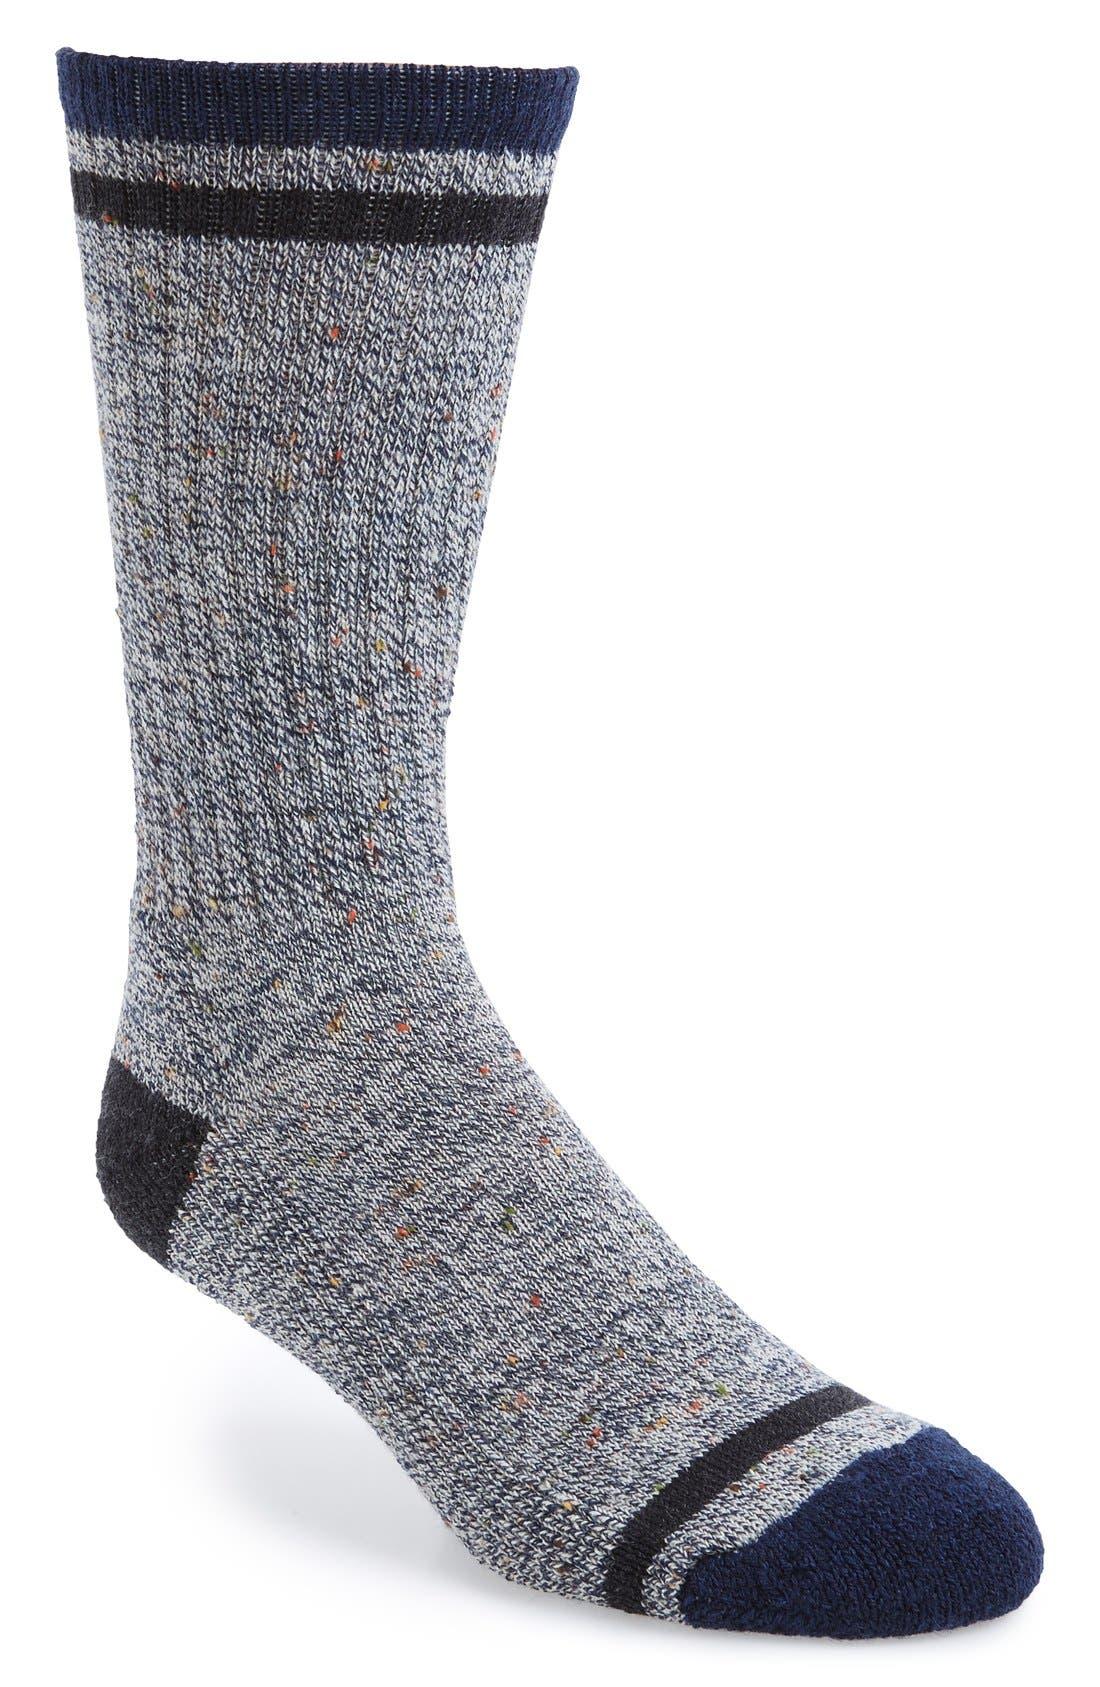 Smartwool 'Larimer' Crew Socks